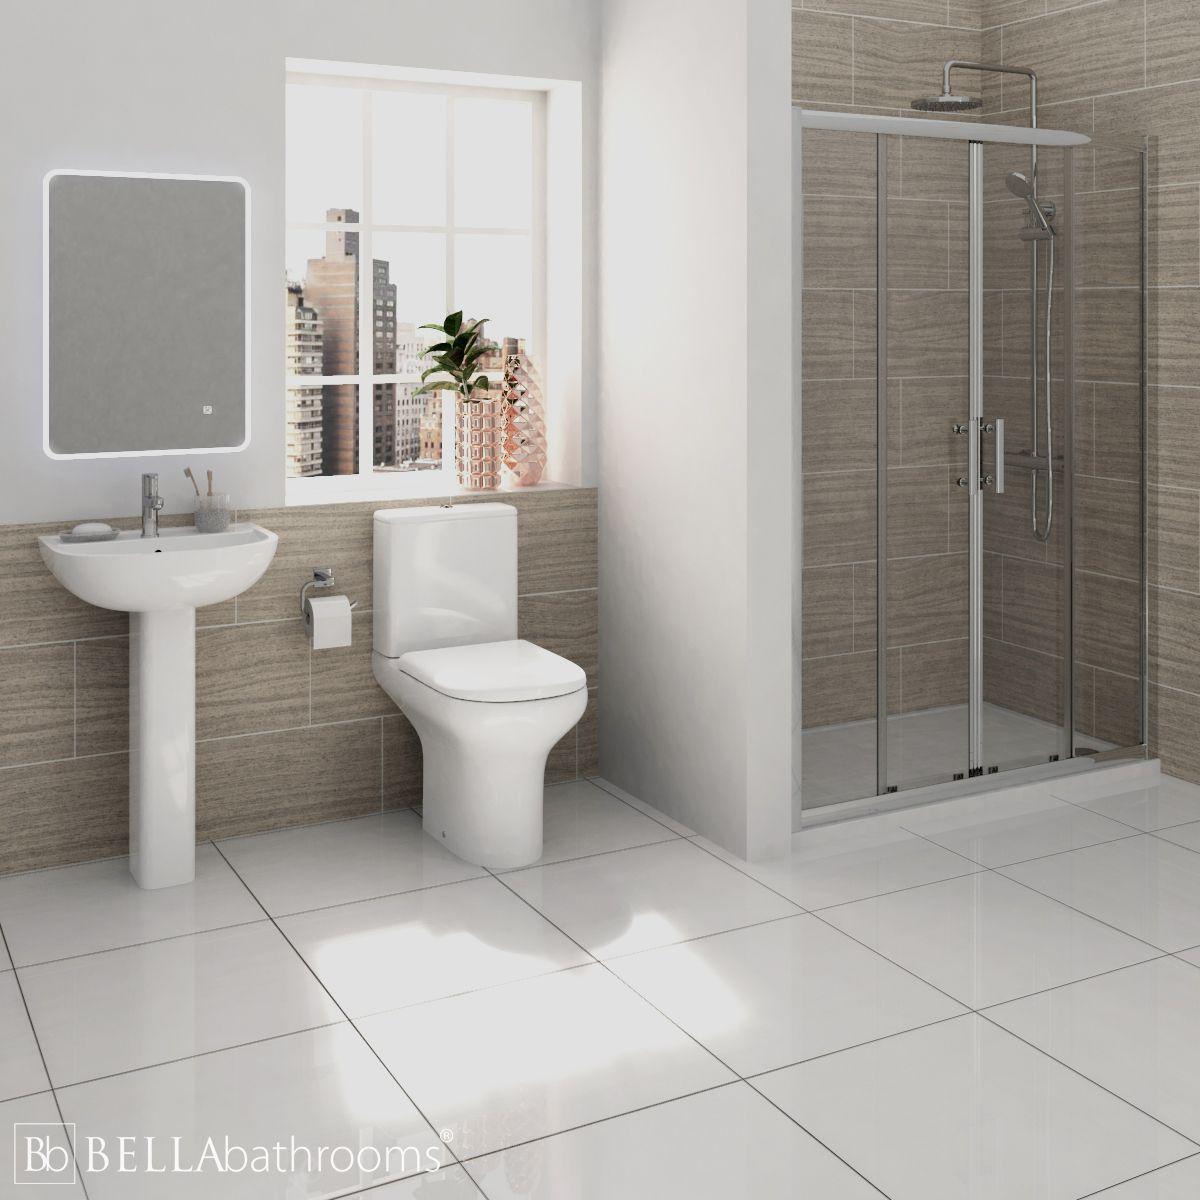 RAK Compact Shower Suite with Pacific Double Sliding Door Shower Enclosure Recess